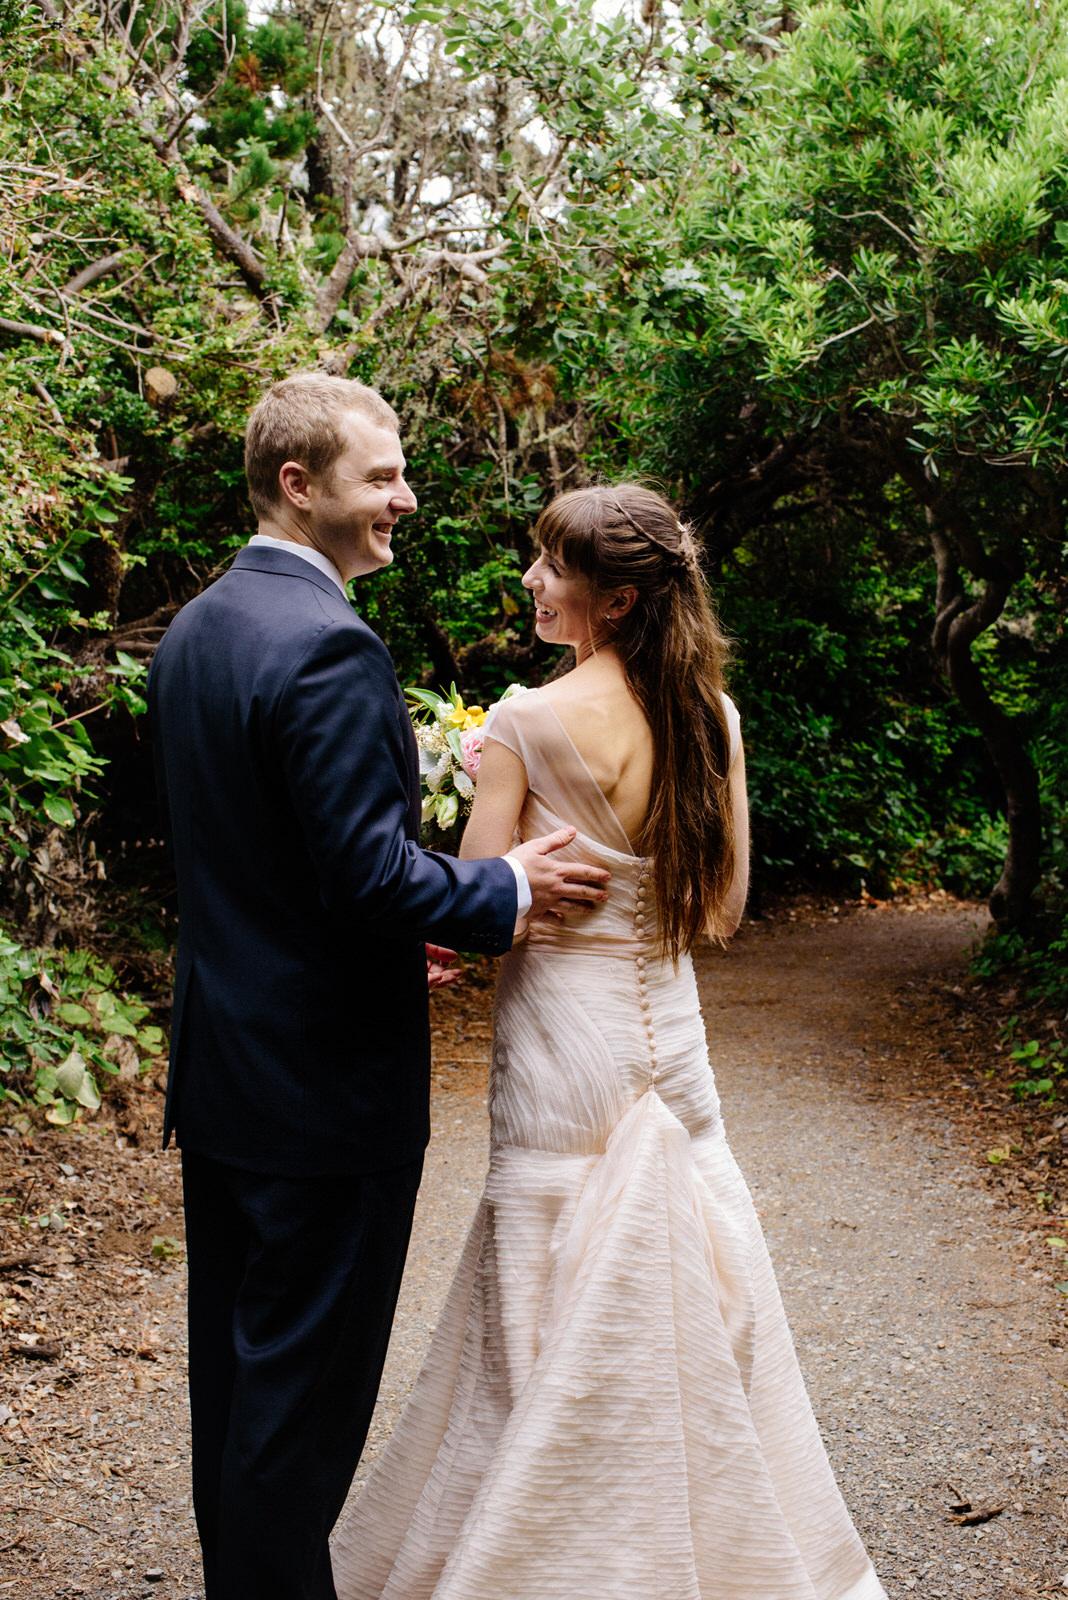 HumboldtCountyPhotographerPatricksPointRomanceWeddingRockBrideGroomTreetopsAllTheWorldSwirl.jpg